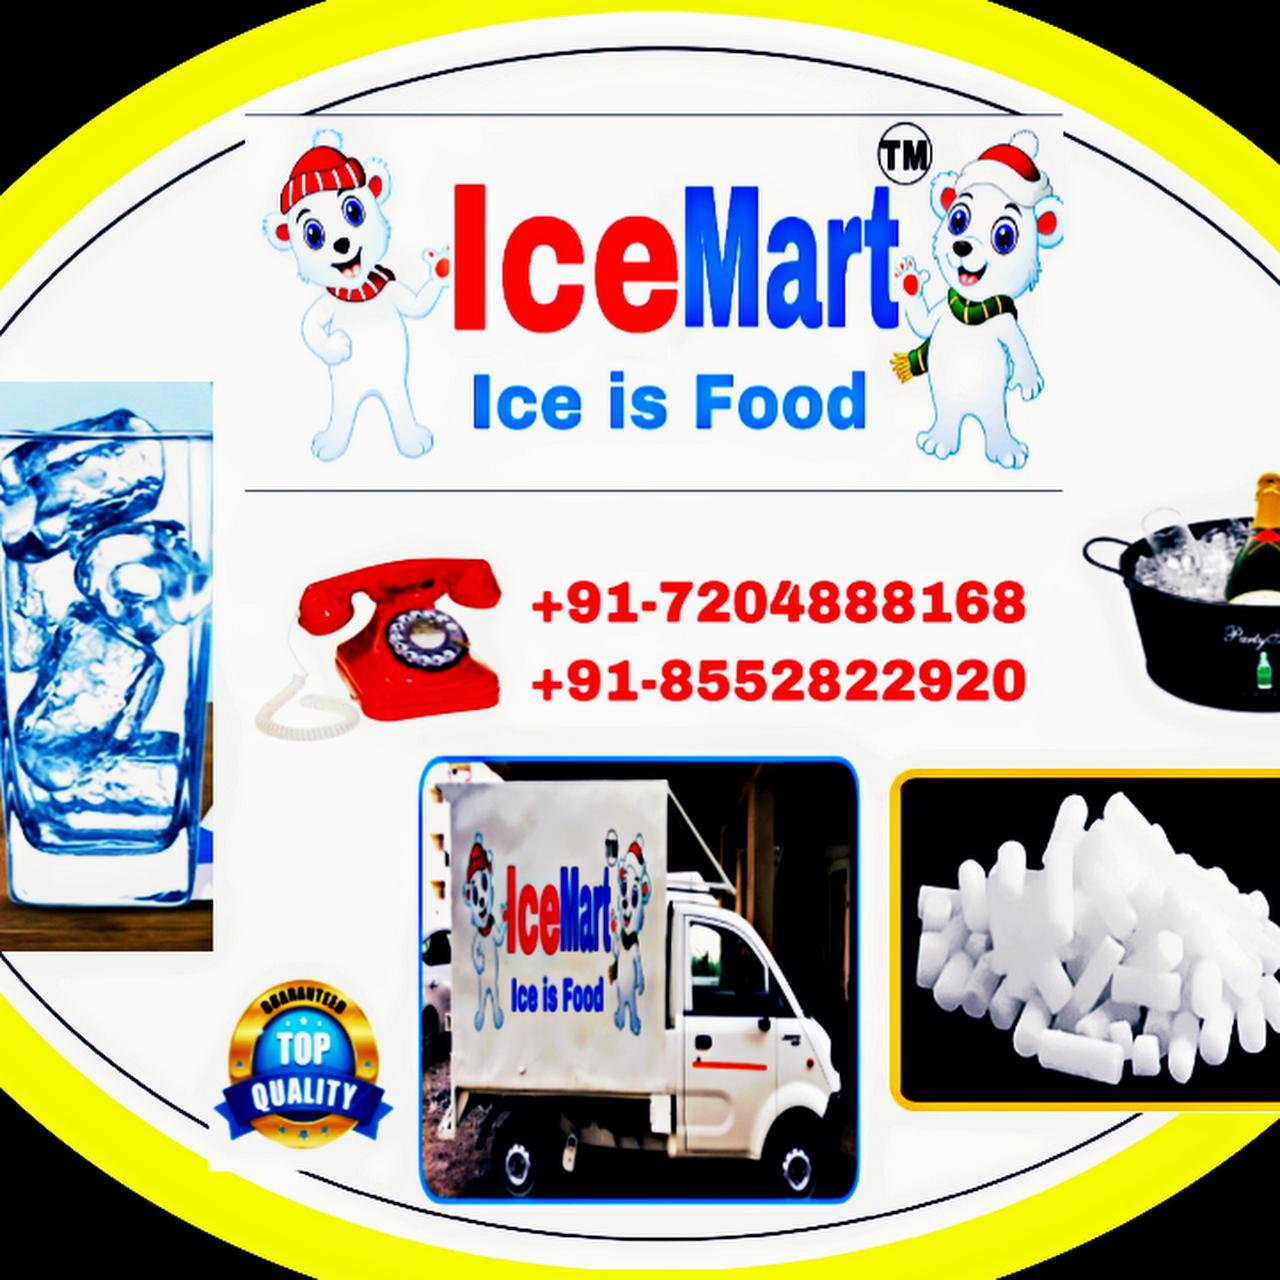 Icemart Ice Company.